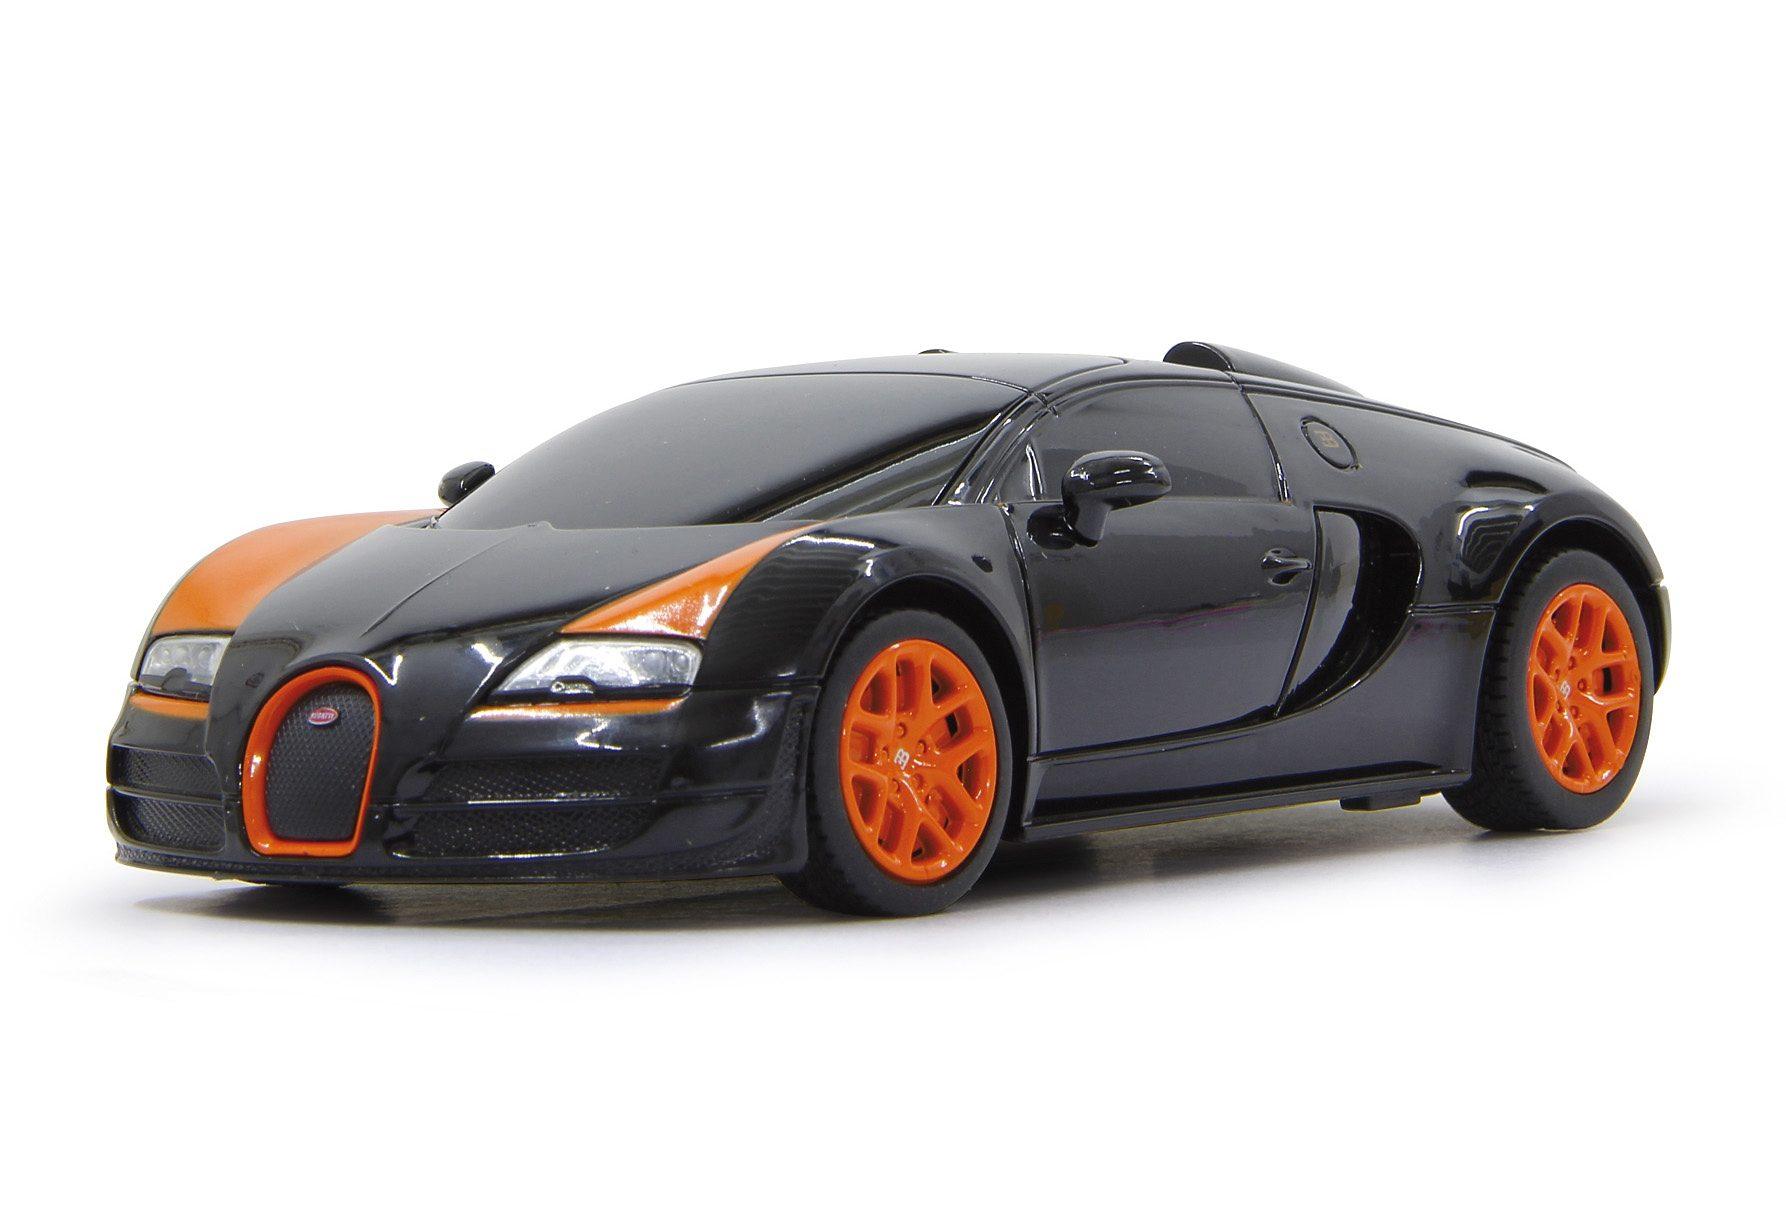 JAMARA RC Fahrzeug, »Bugatti Grand Sport Vitesse - 40 MHz schwarz«